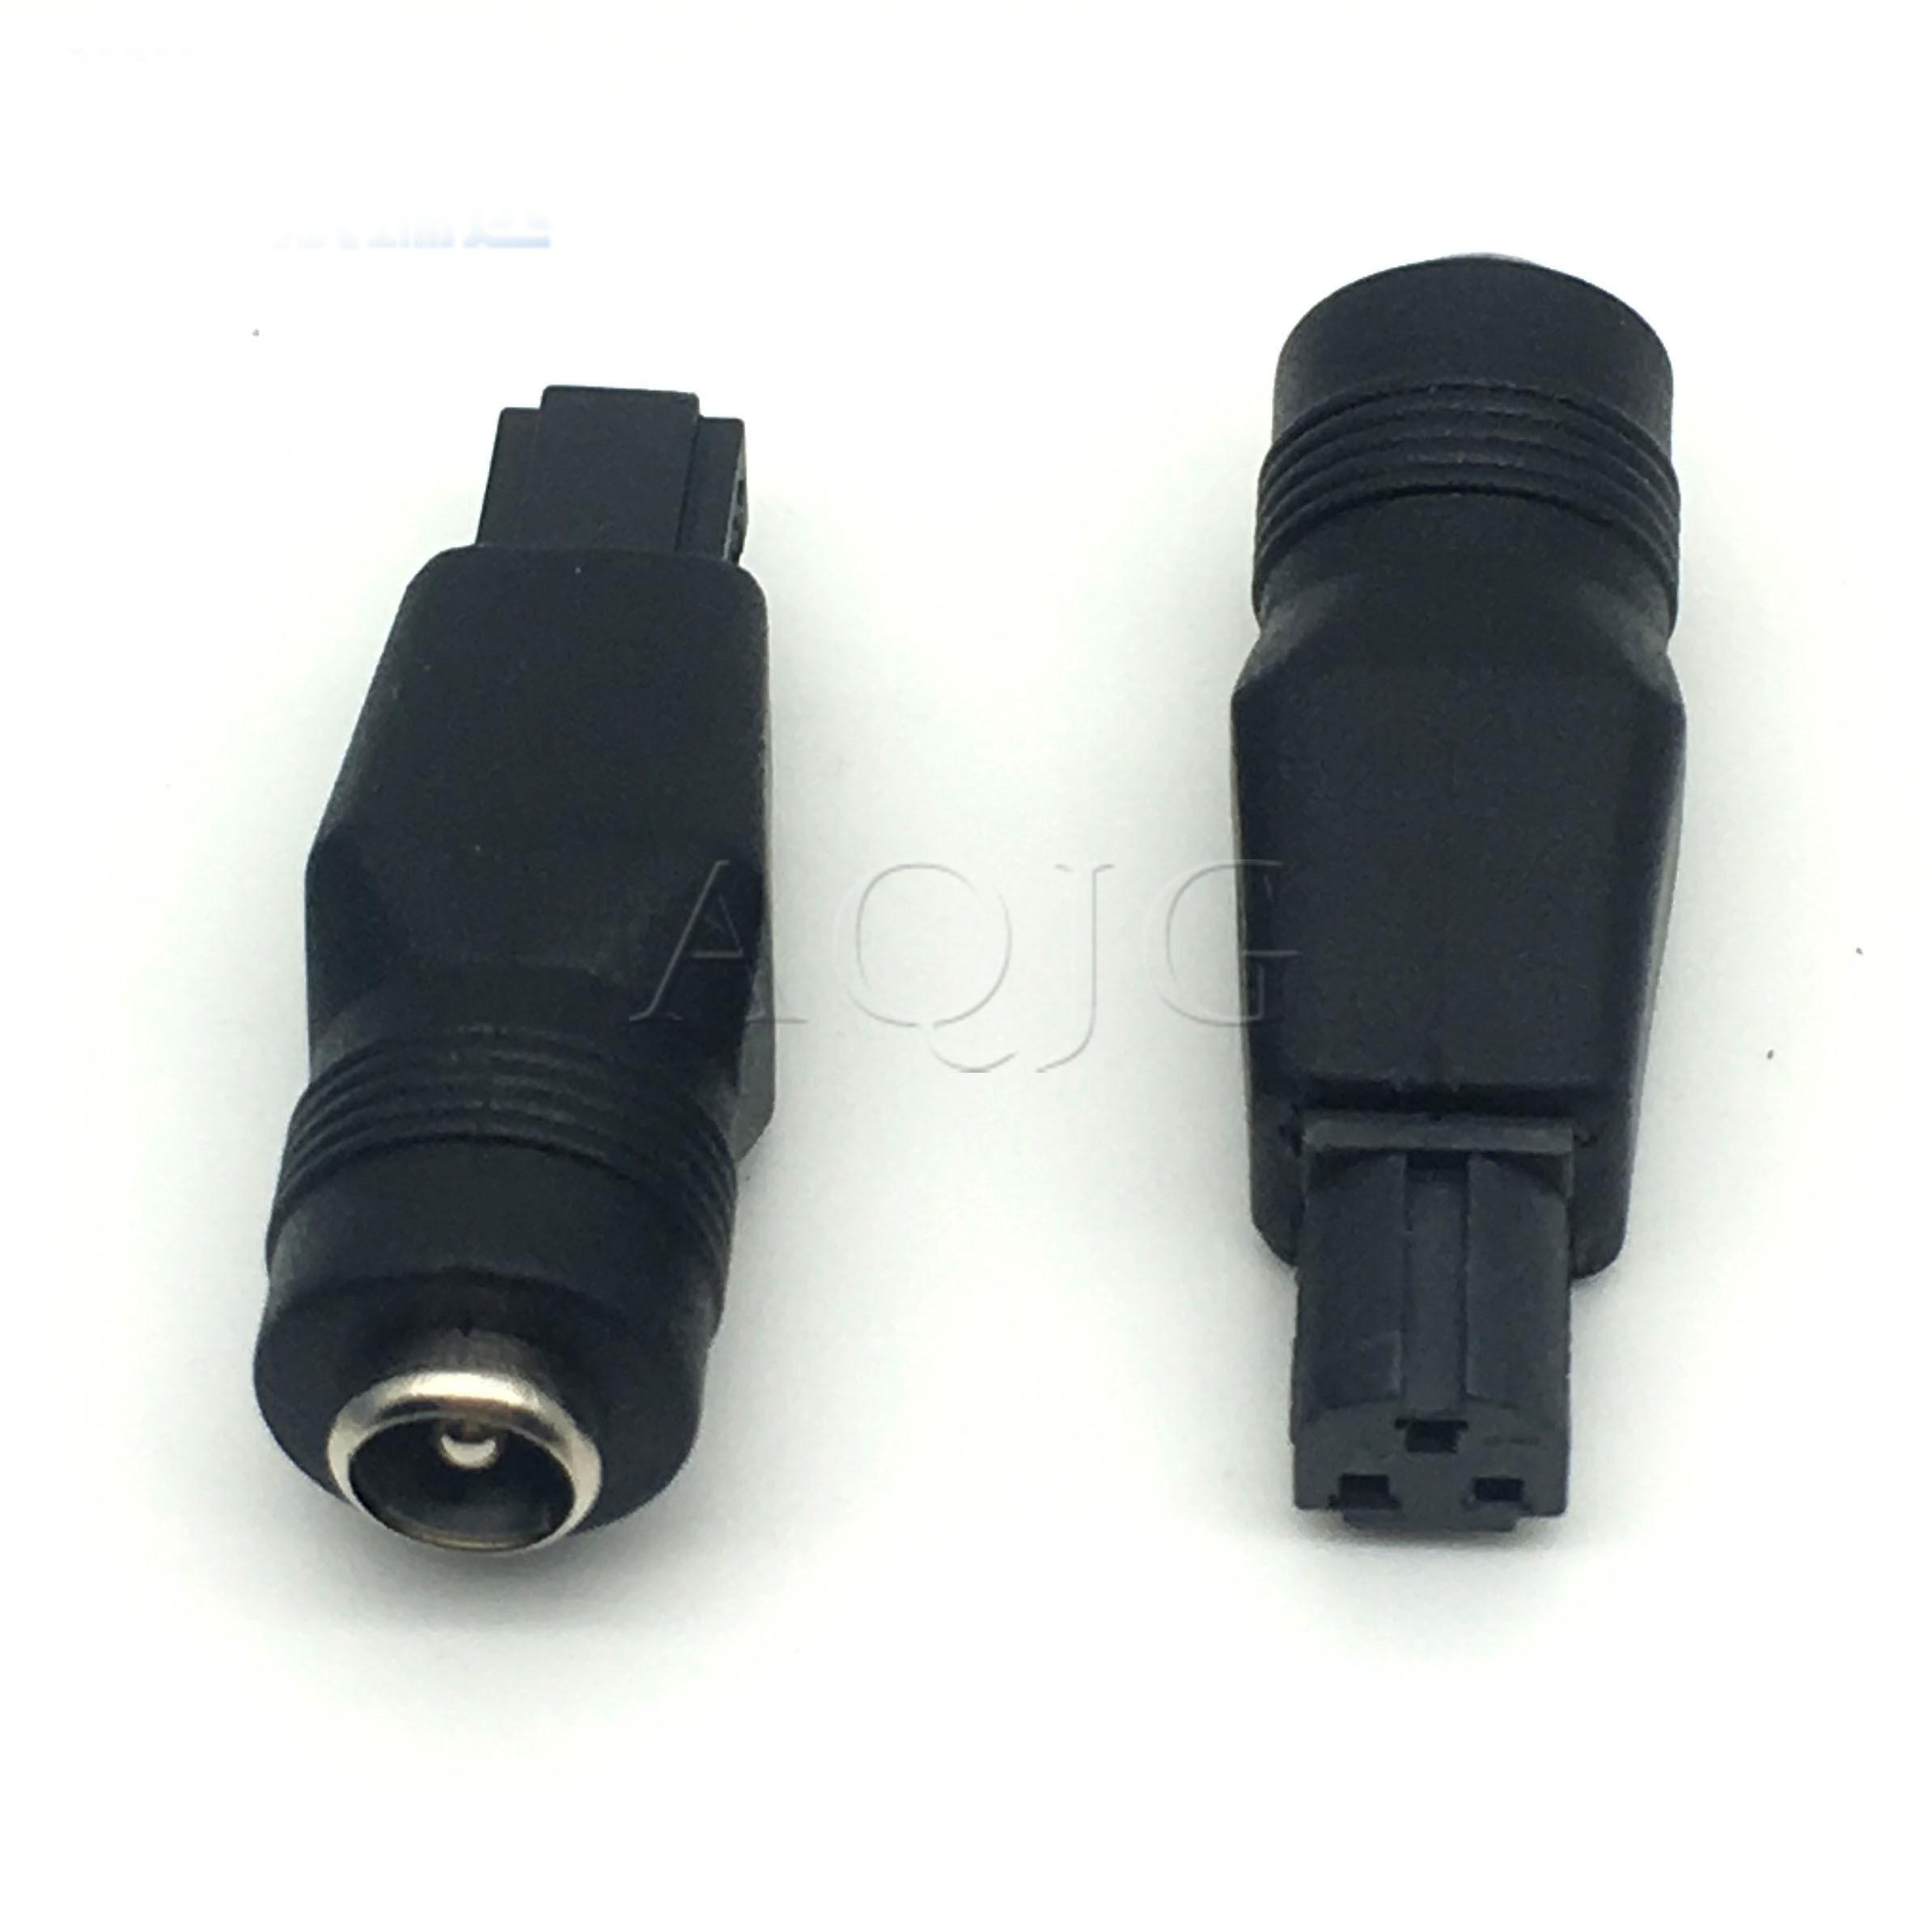 Para Dell adaptador de corriente de tres agujeros DC5.5 * 2,1 A 3 agujeros/pin macho enchufe de CC convertidor de conector de alimentación para ordenador portátil Dell